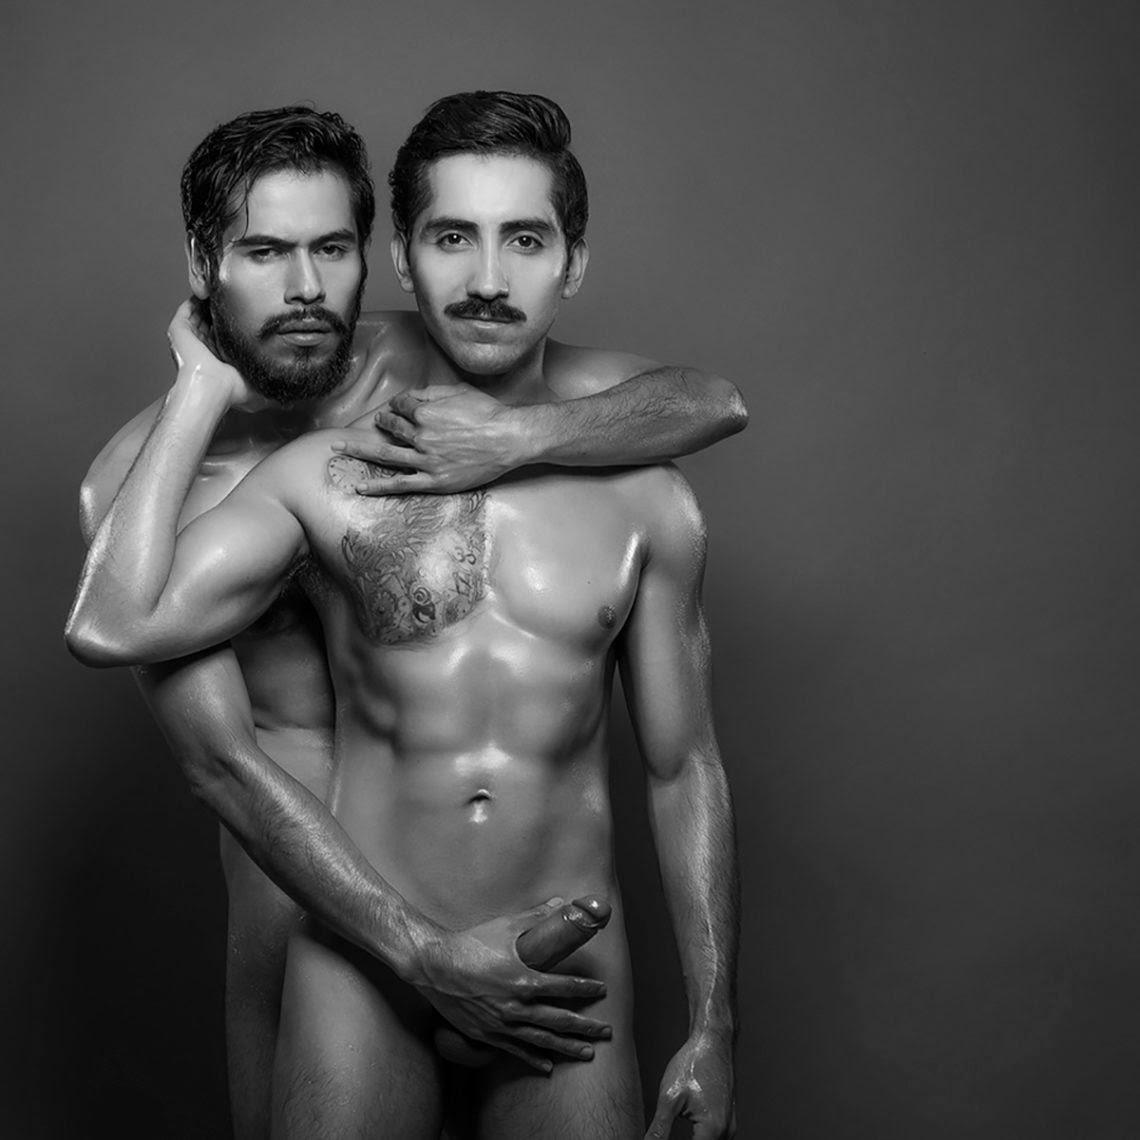 Smooth Coupling, by Carlos Martínez Guzmán ft Tobías Dragón and Francisco Garibay (NSFW)